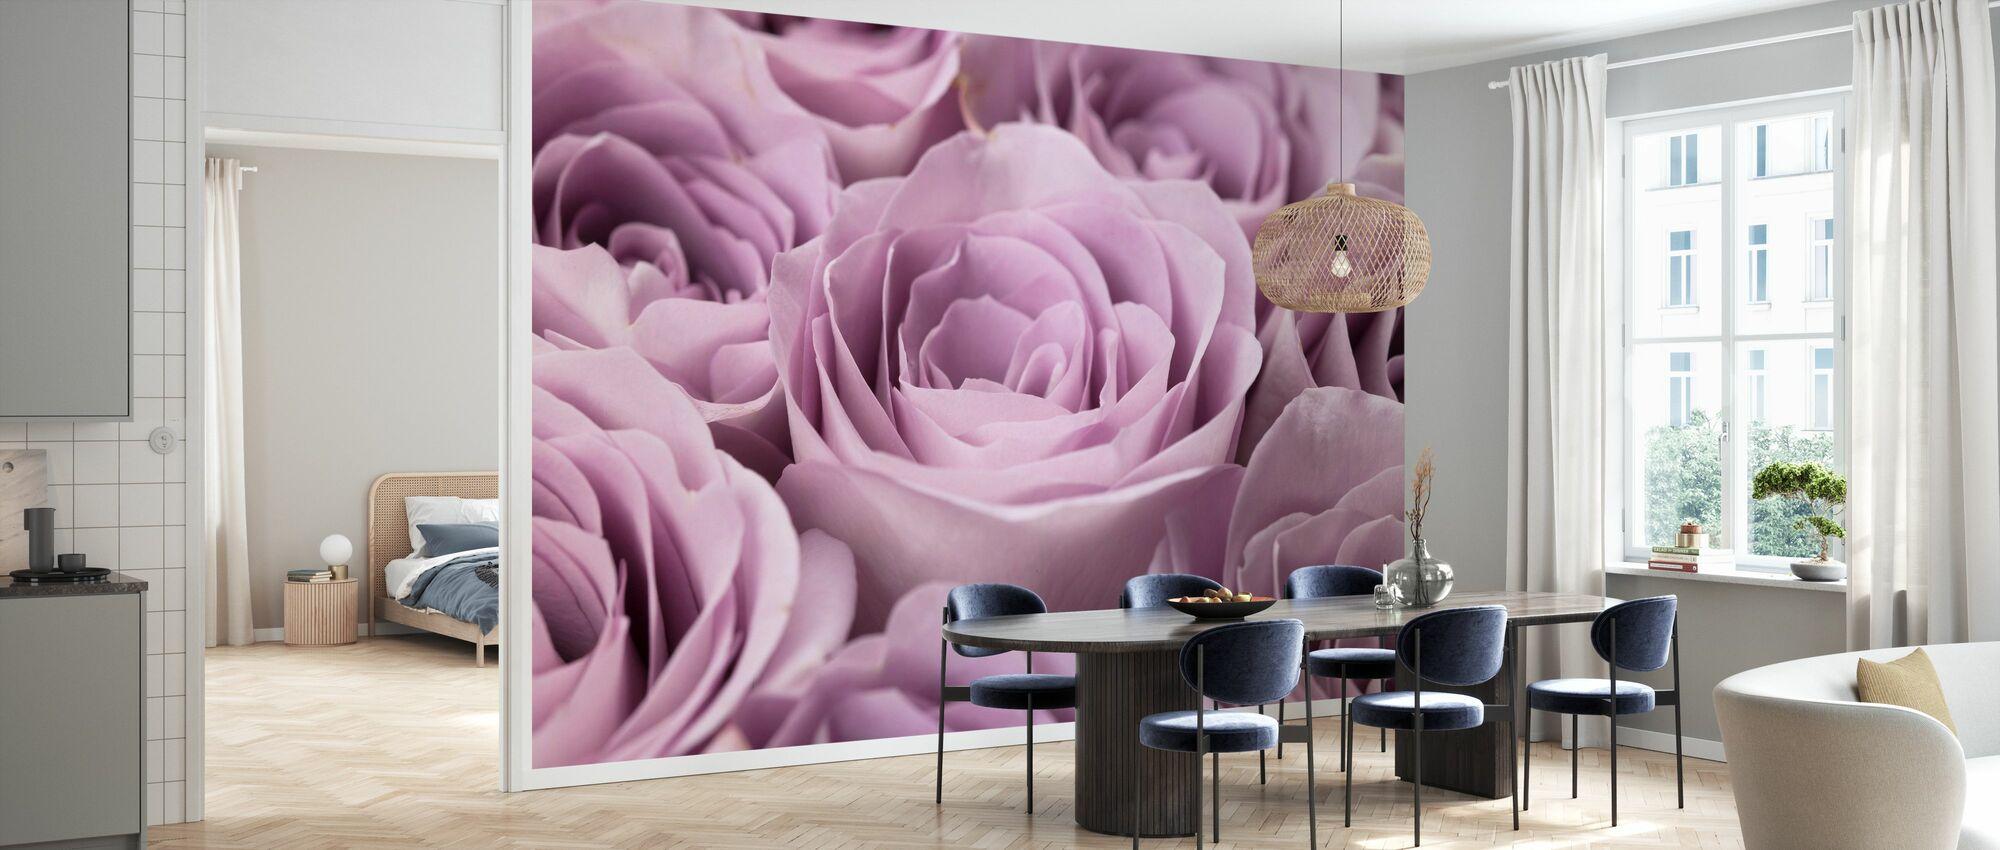 Roses - Wallpaper - Kitchen